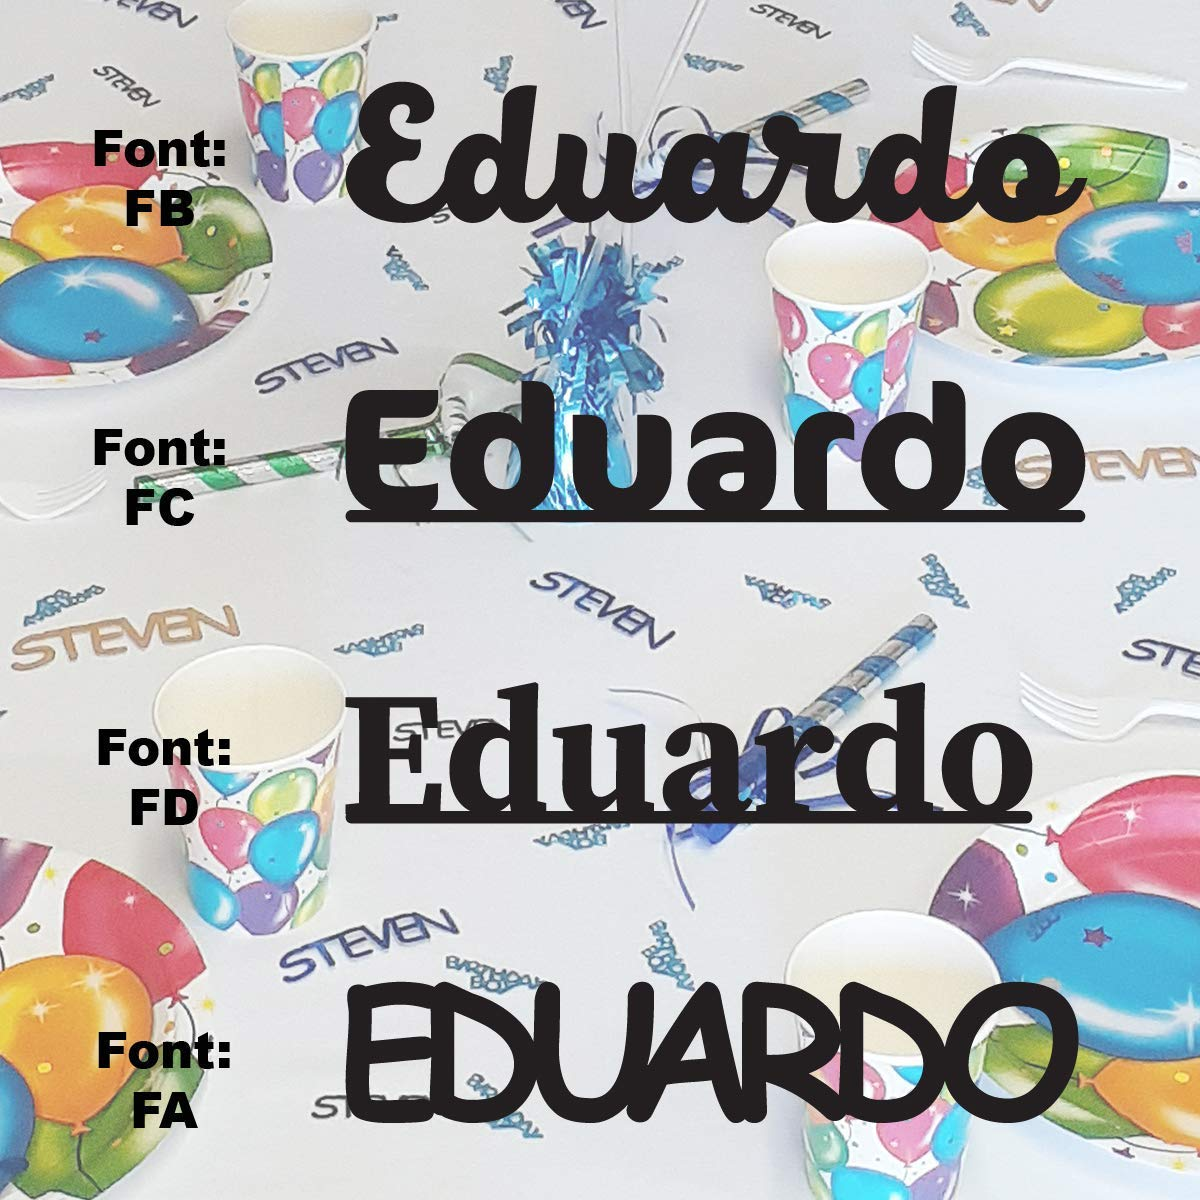 EDUARDO Reservation - Name trend rank Confetti in Includes Metallic Colors. 12